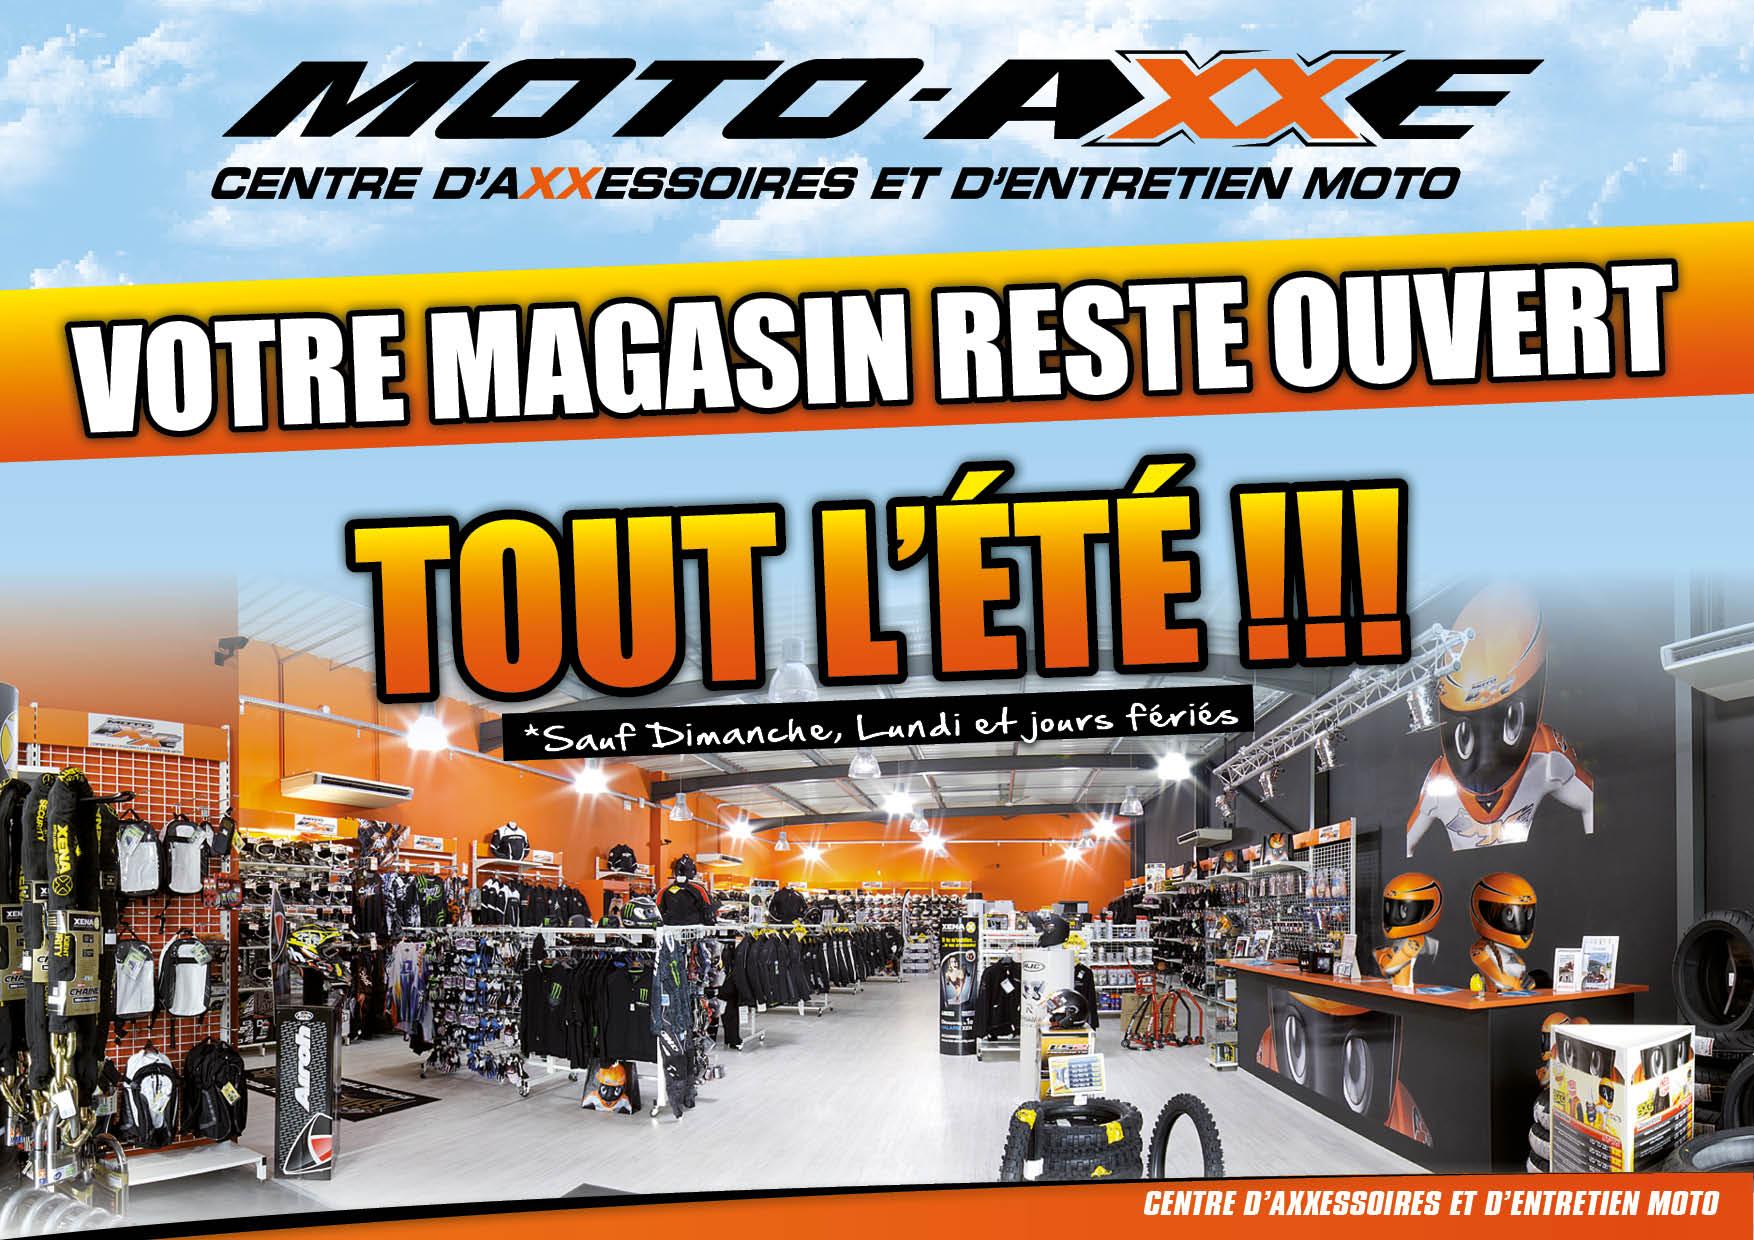 MOTO AXXE & LEMANSMOTO OUVERTS TOUT L'ETE